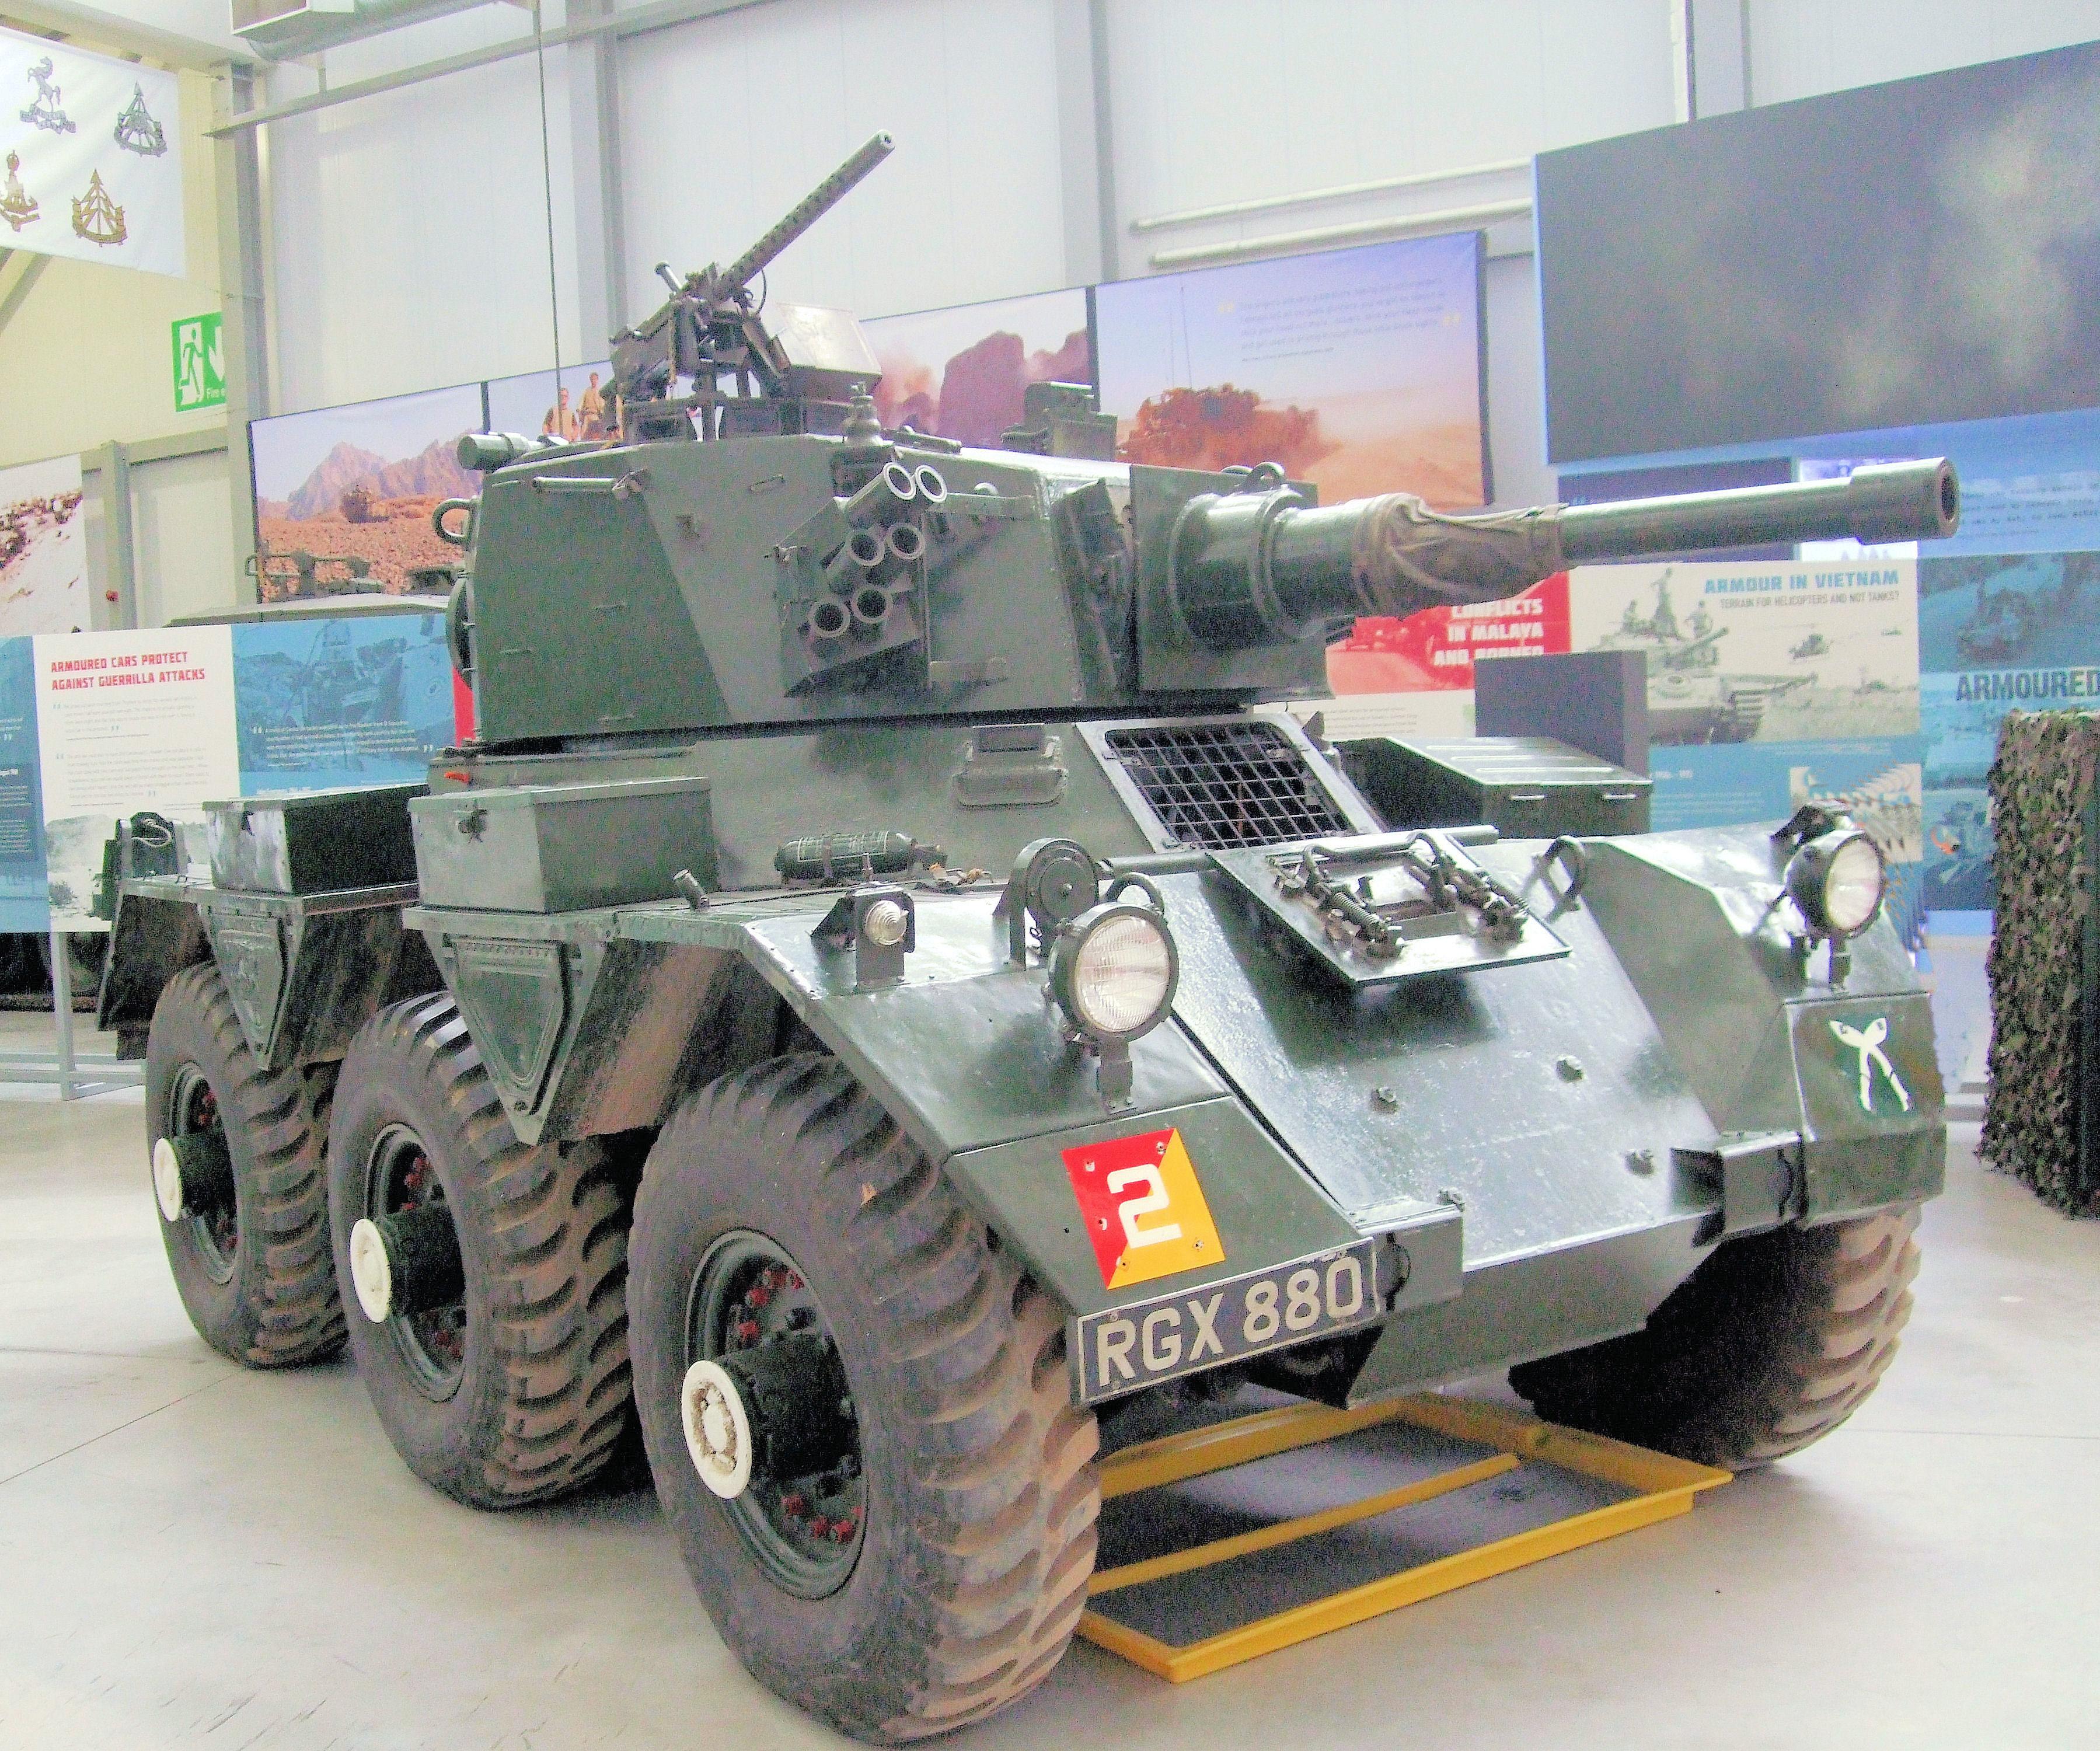 File:Saladin Armoured Car, Bovington Tank Museum - Dorset